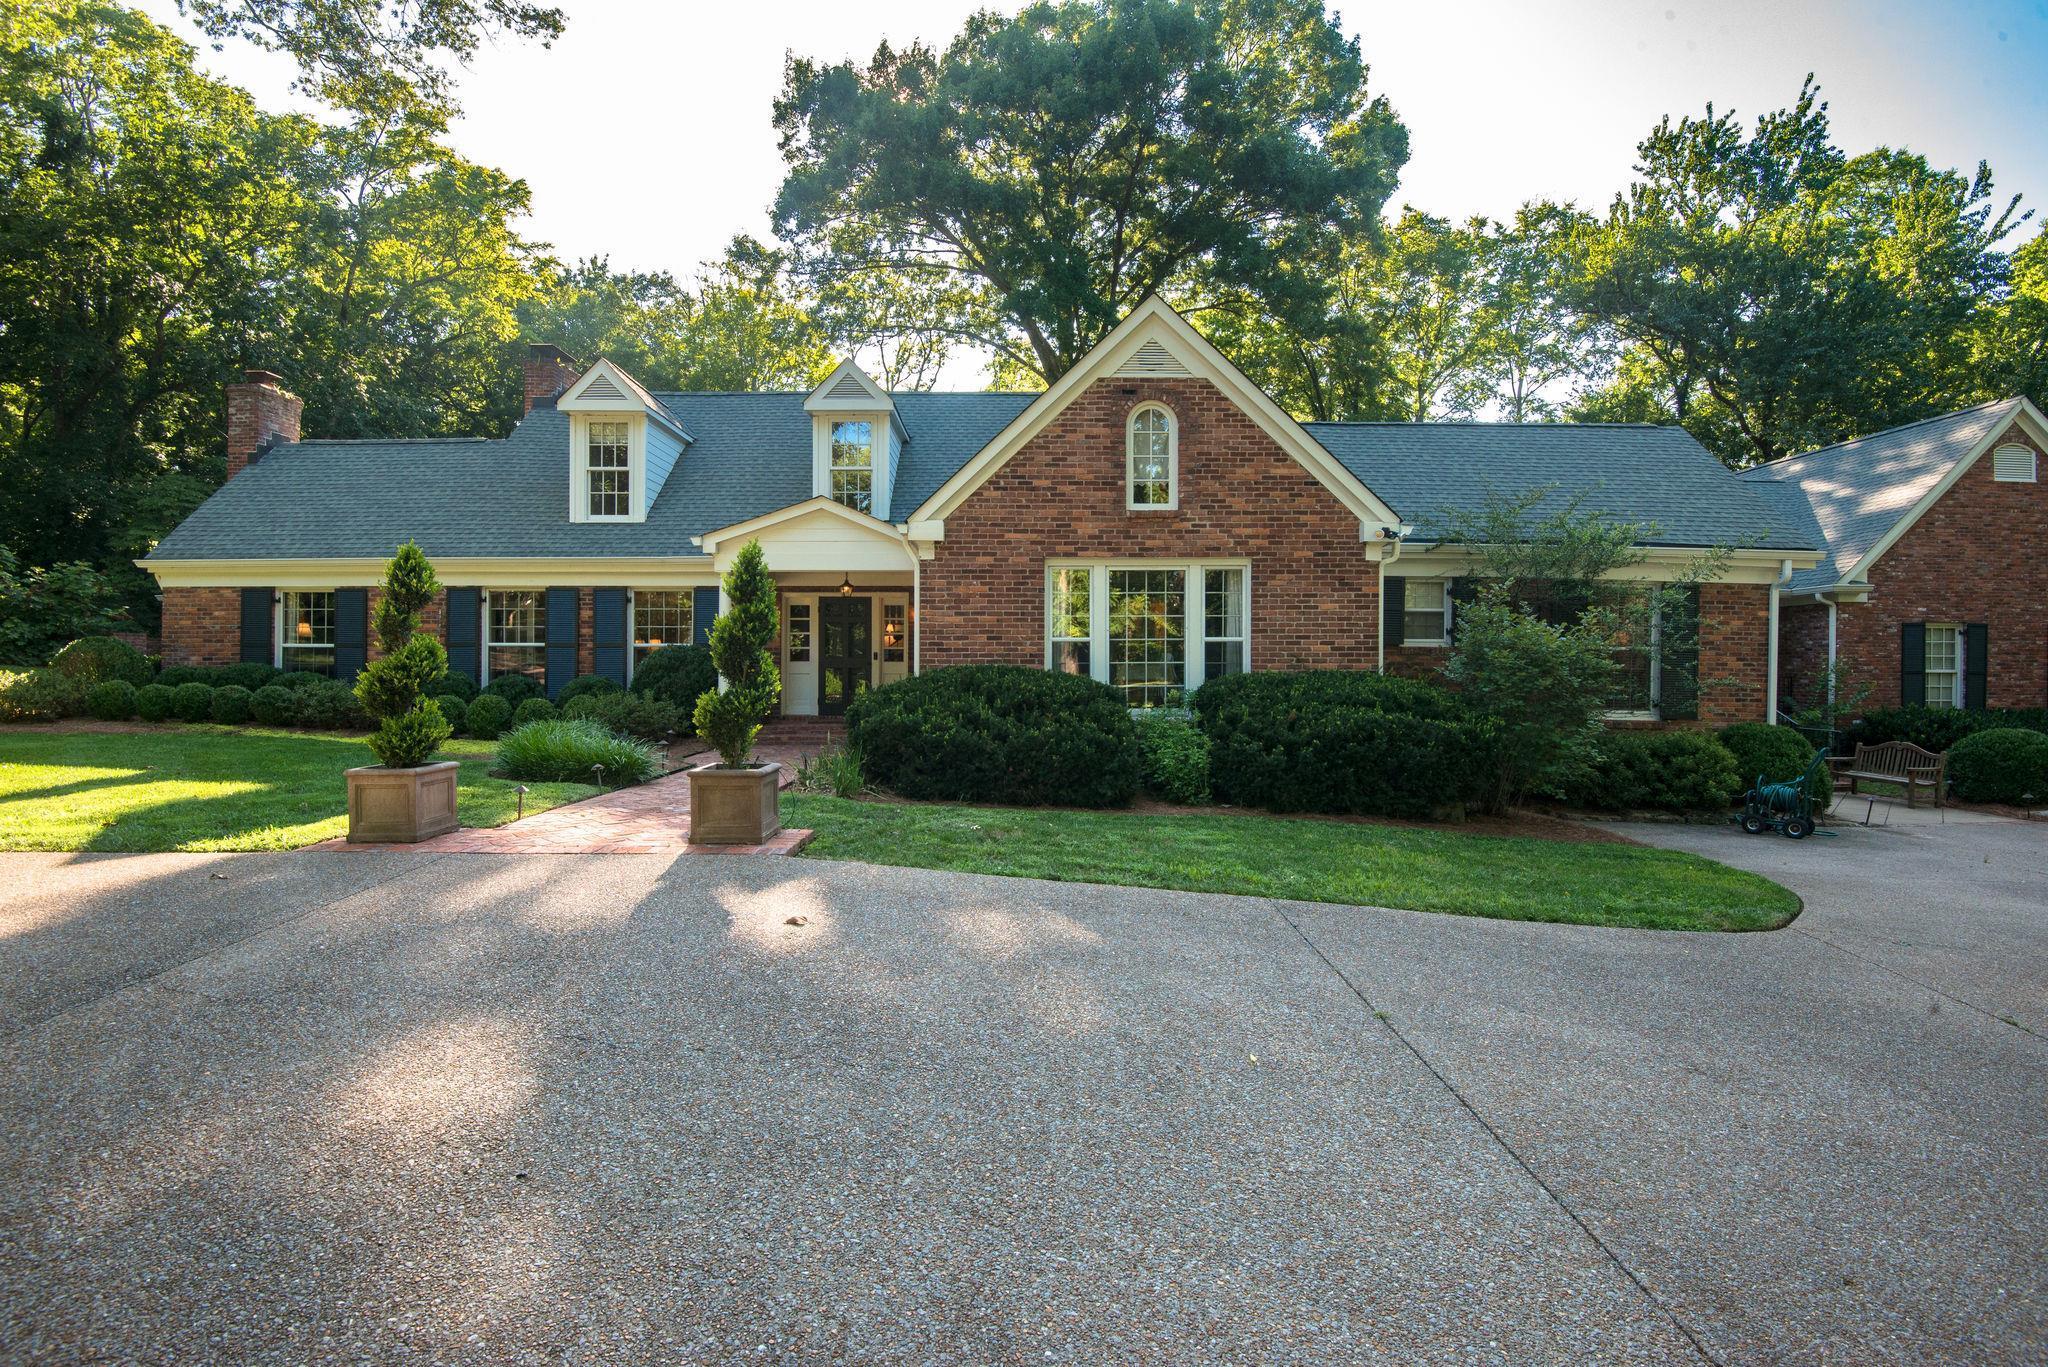 4911 Sewanee Rd, Nashville, TN 37220 - Nashville, TN real estate listing